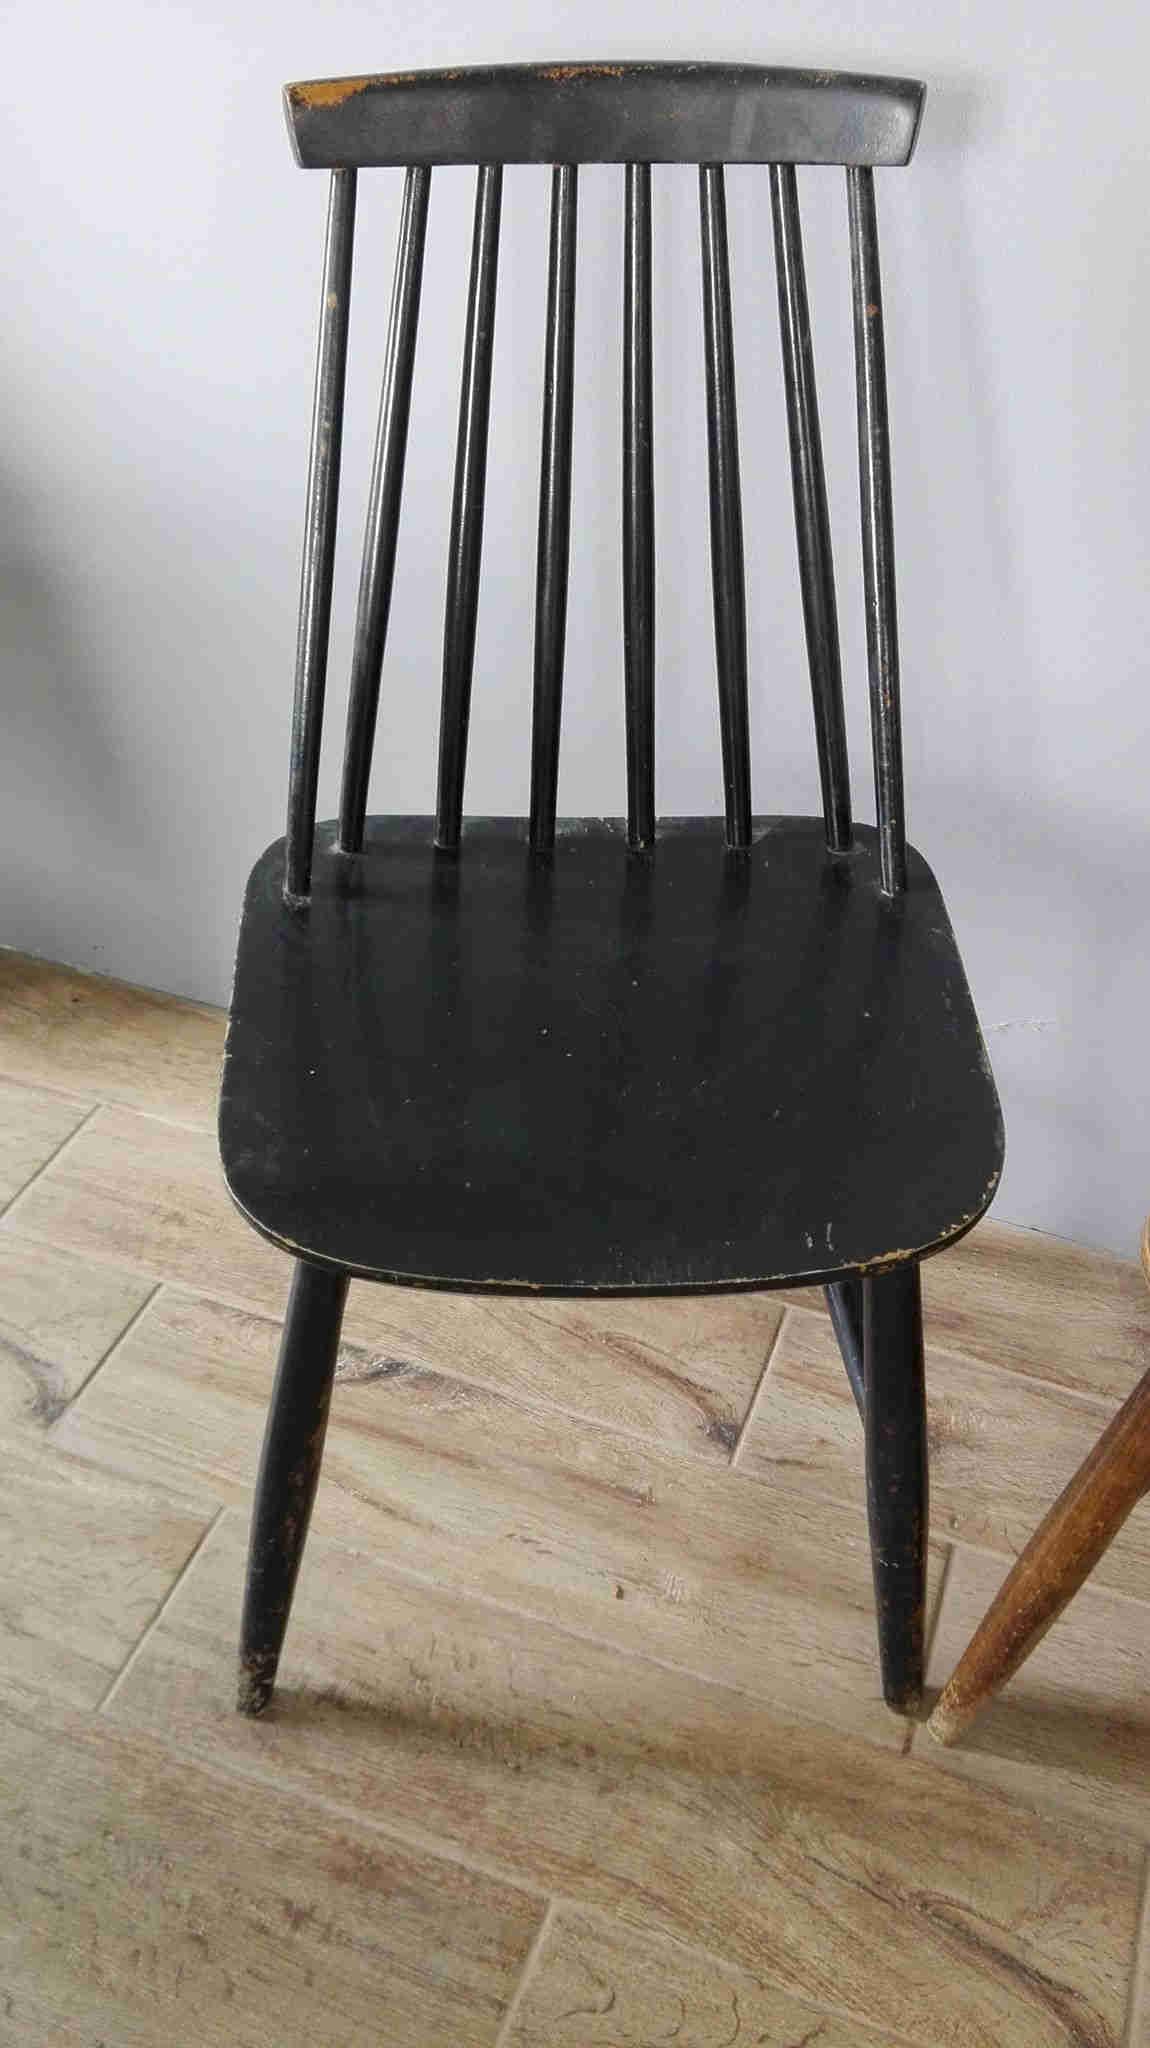 Krzesło fameg model A5910